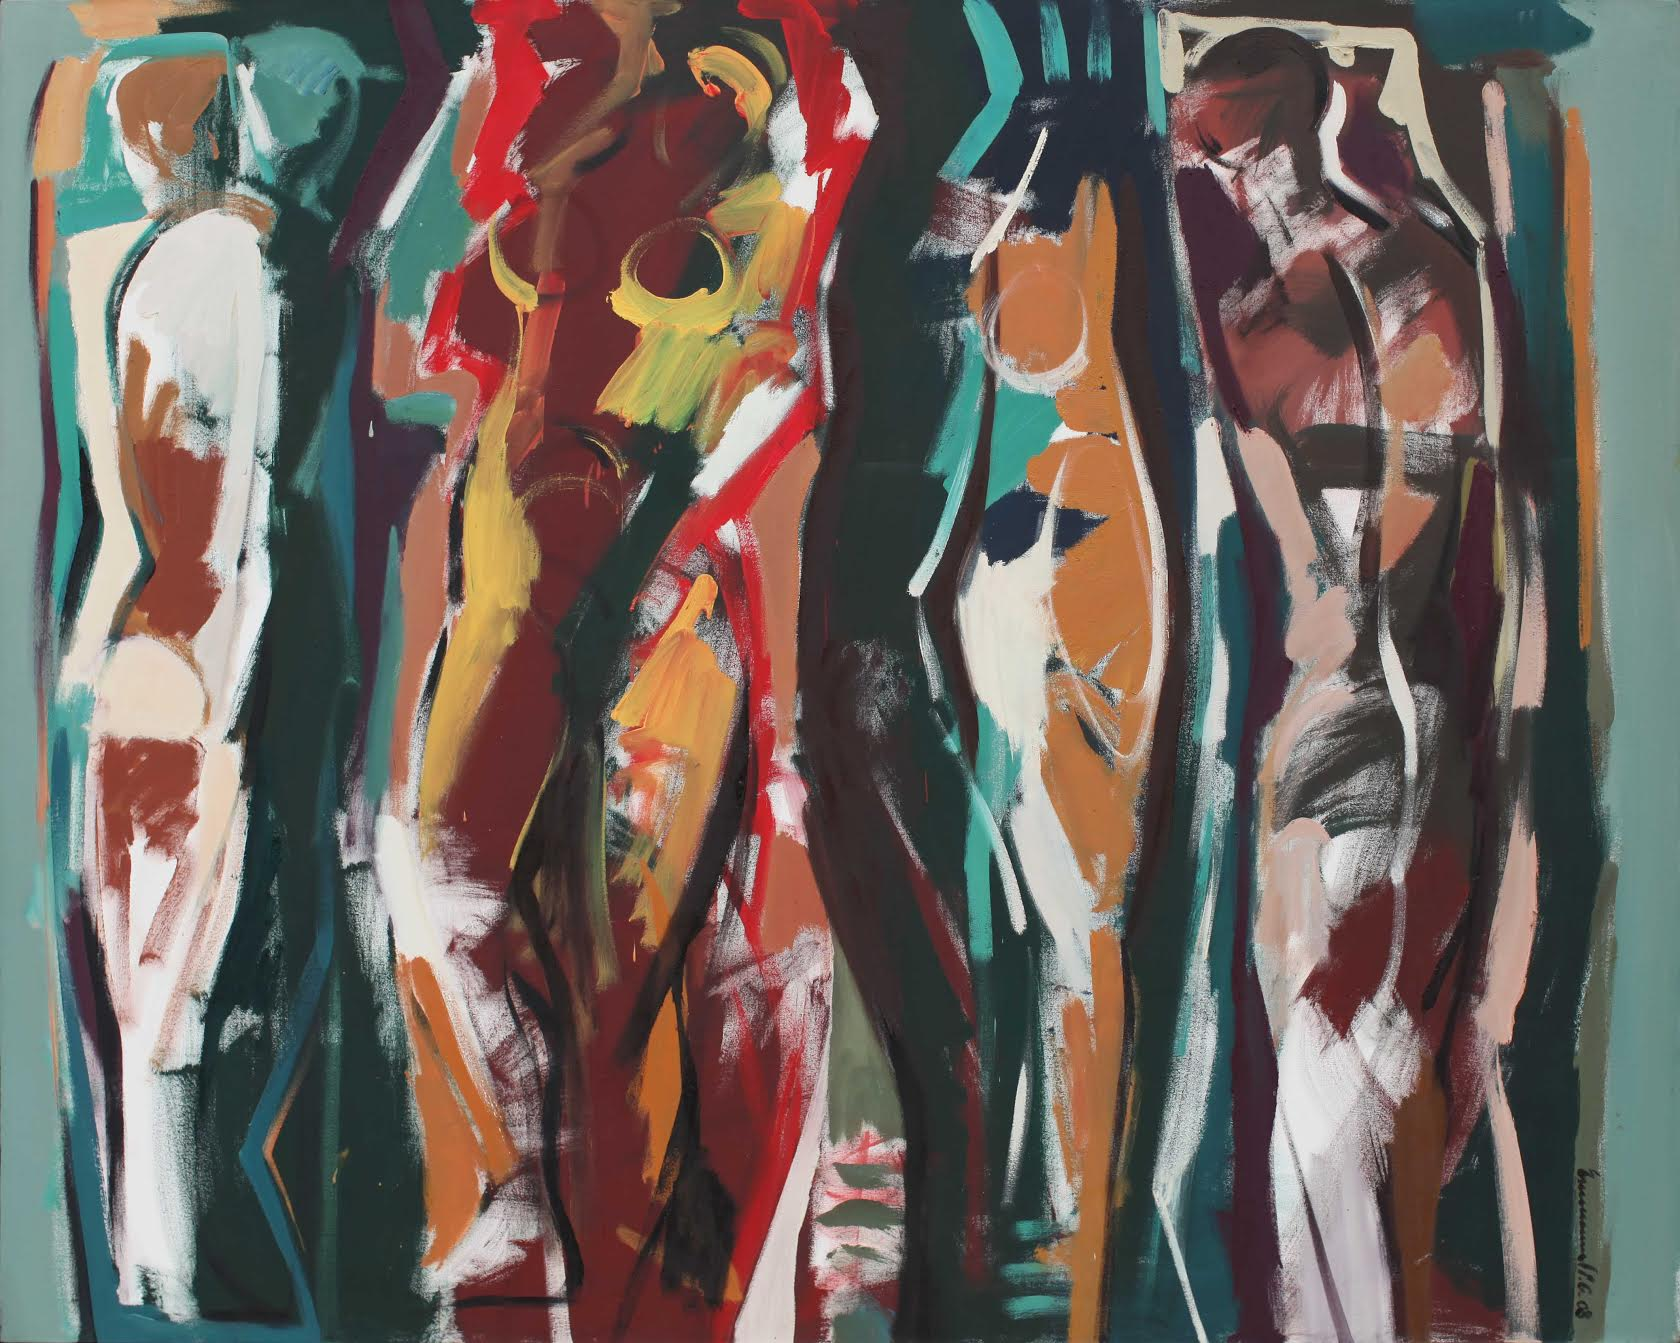 ART WEEK - Art Dubai